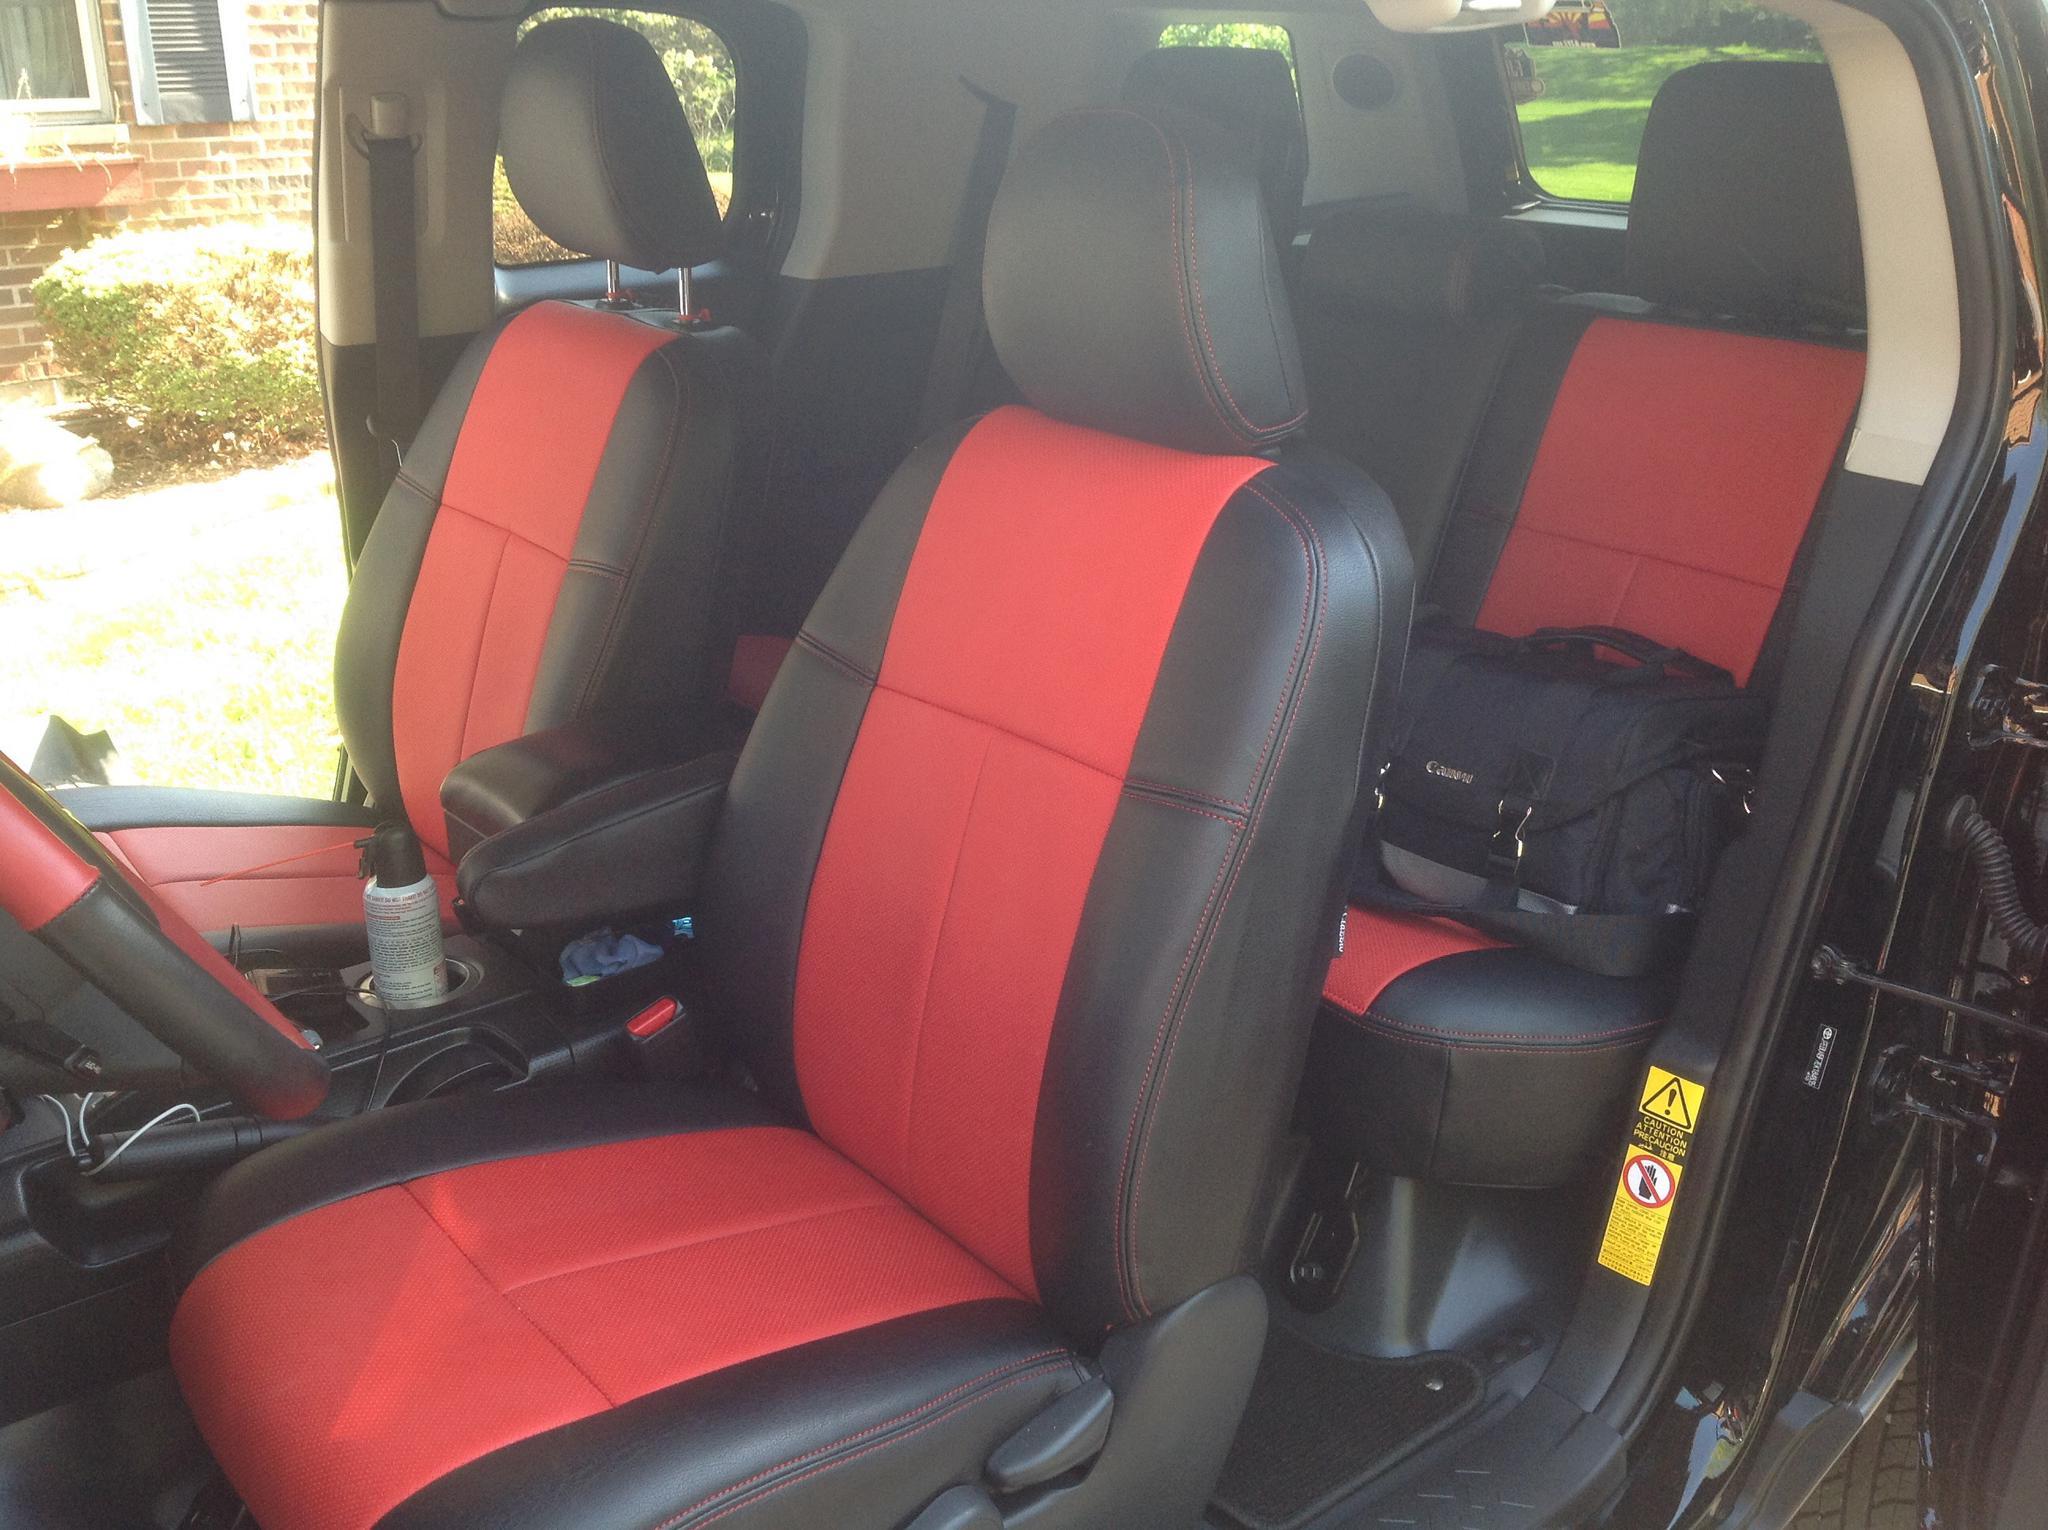 Rhino Liner Cost >> Seat Covers for FJ CRUISER 2006+ - Toyota FJ Cruiser Forum